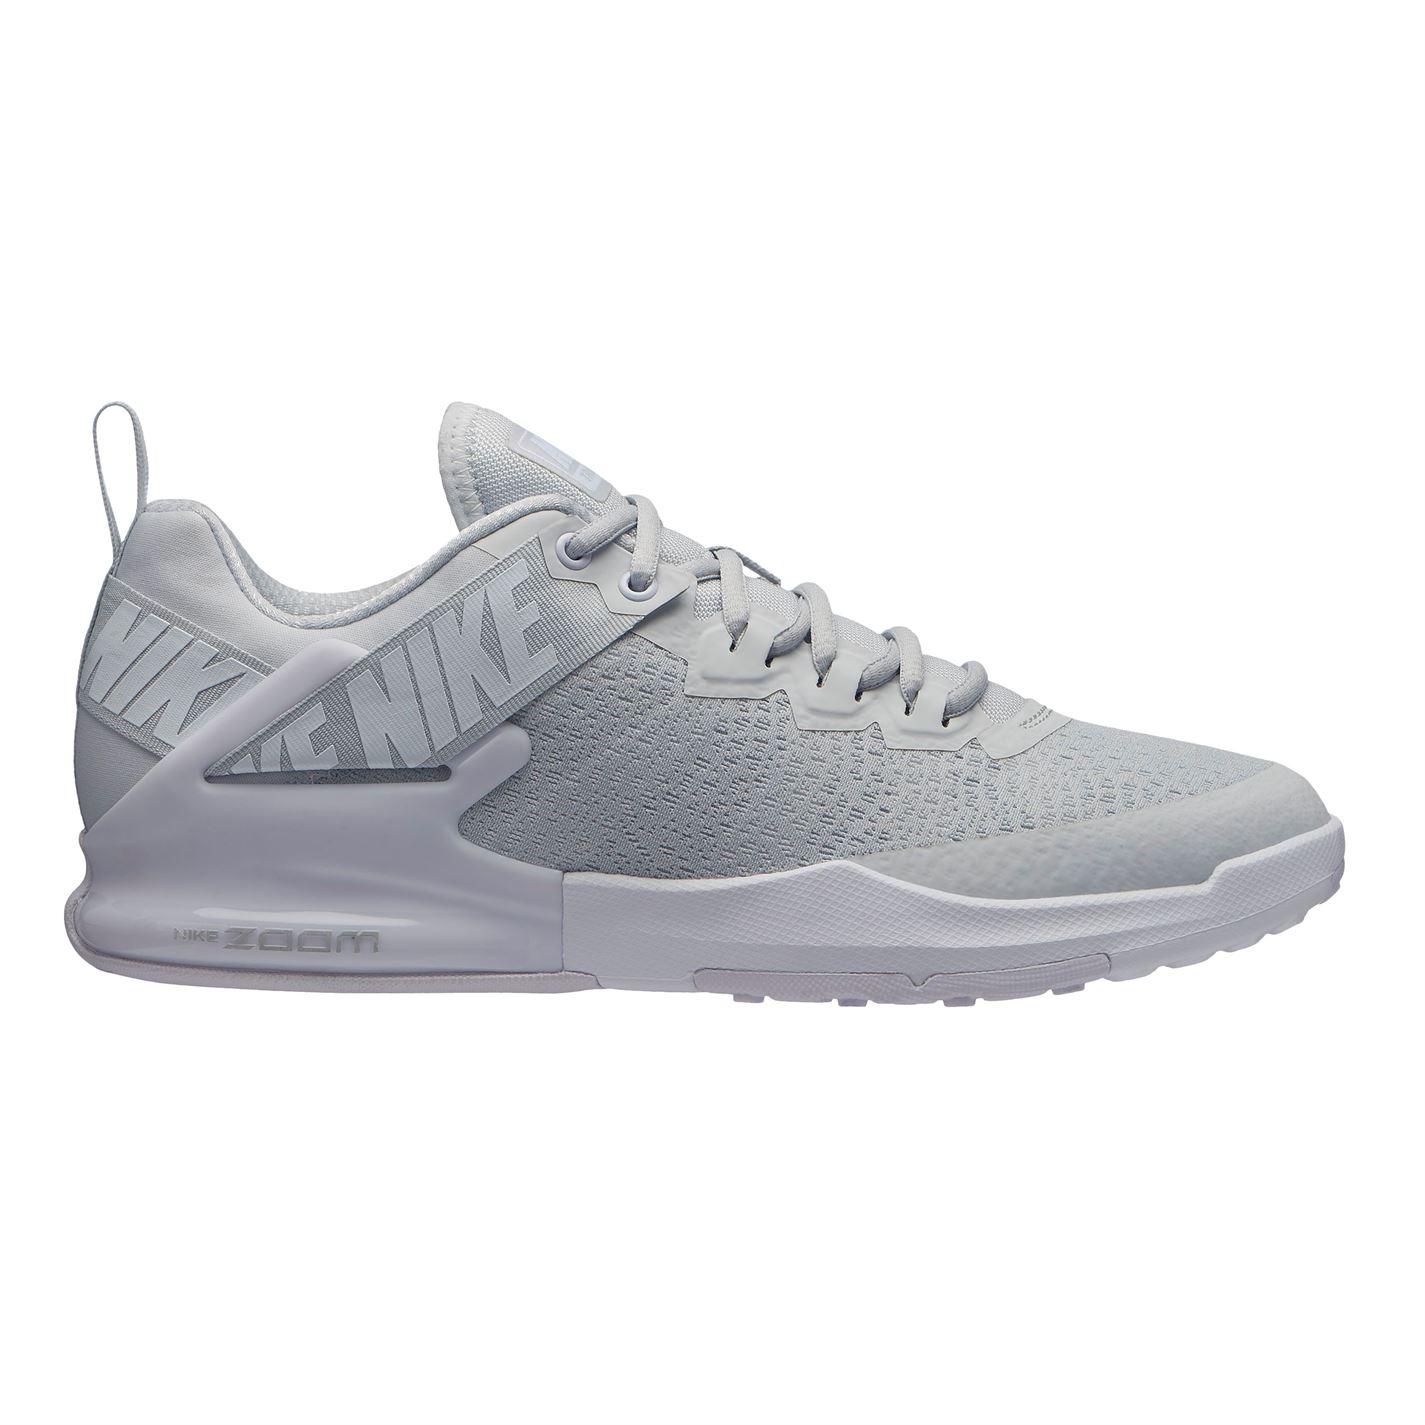 purchase cheap c4a16 df4ff Nike Dual Fusion 4 Mens Training Shoes